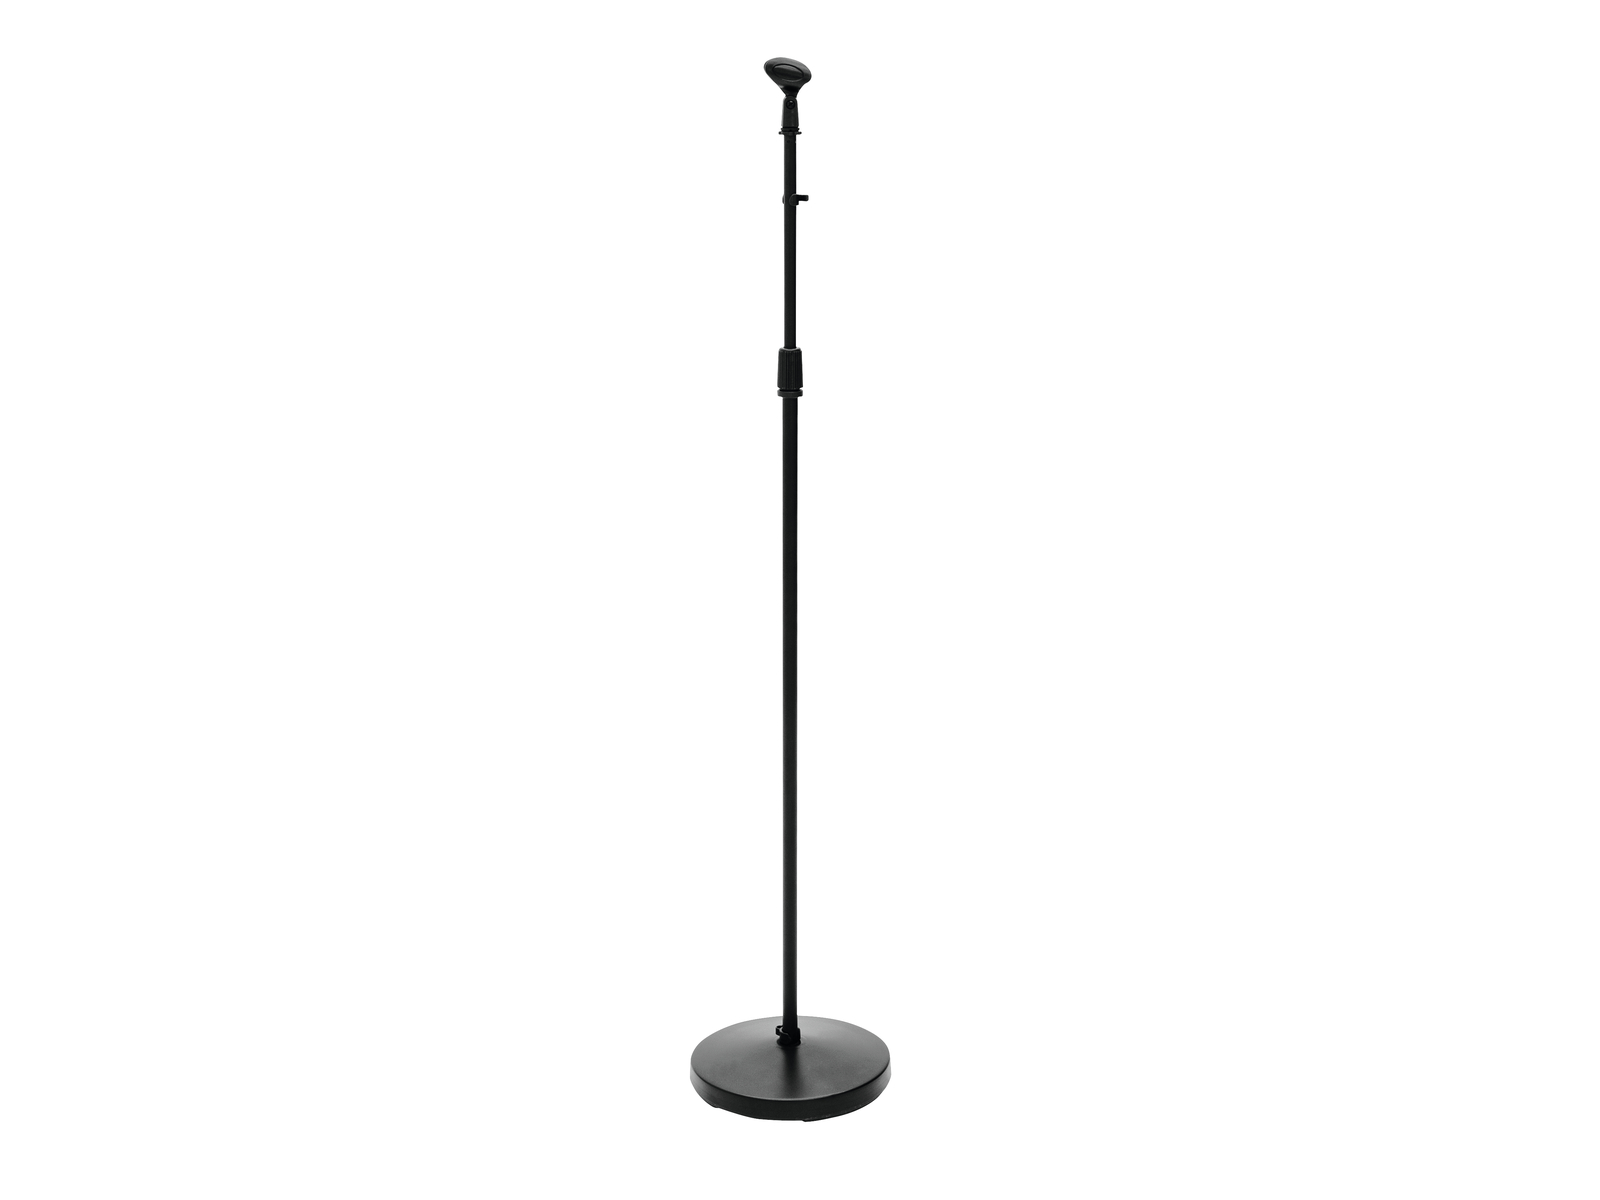 OMNITRONIC Stand Microfono 100-170cm bk